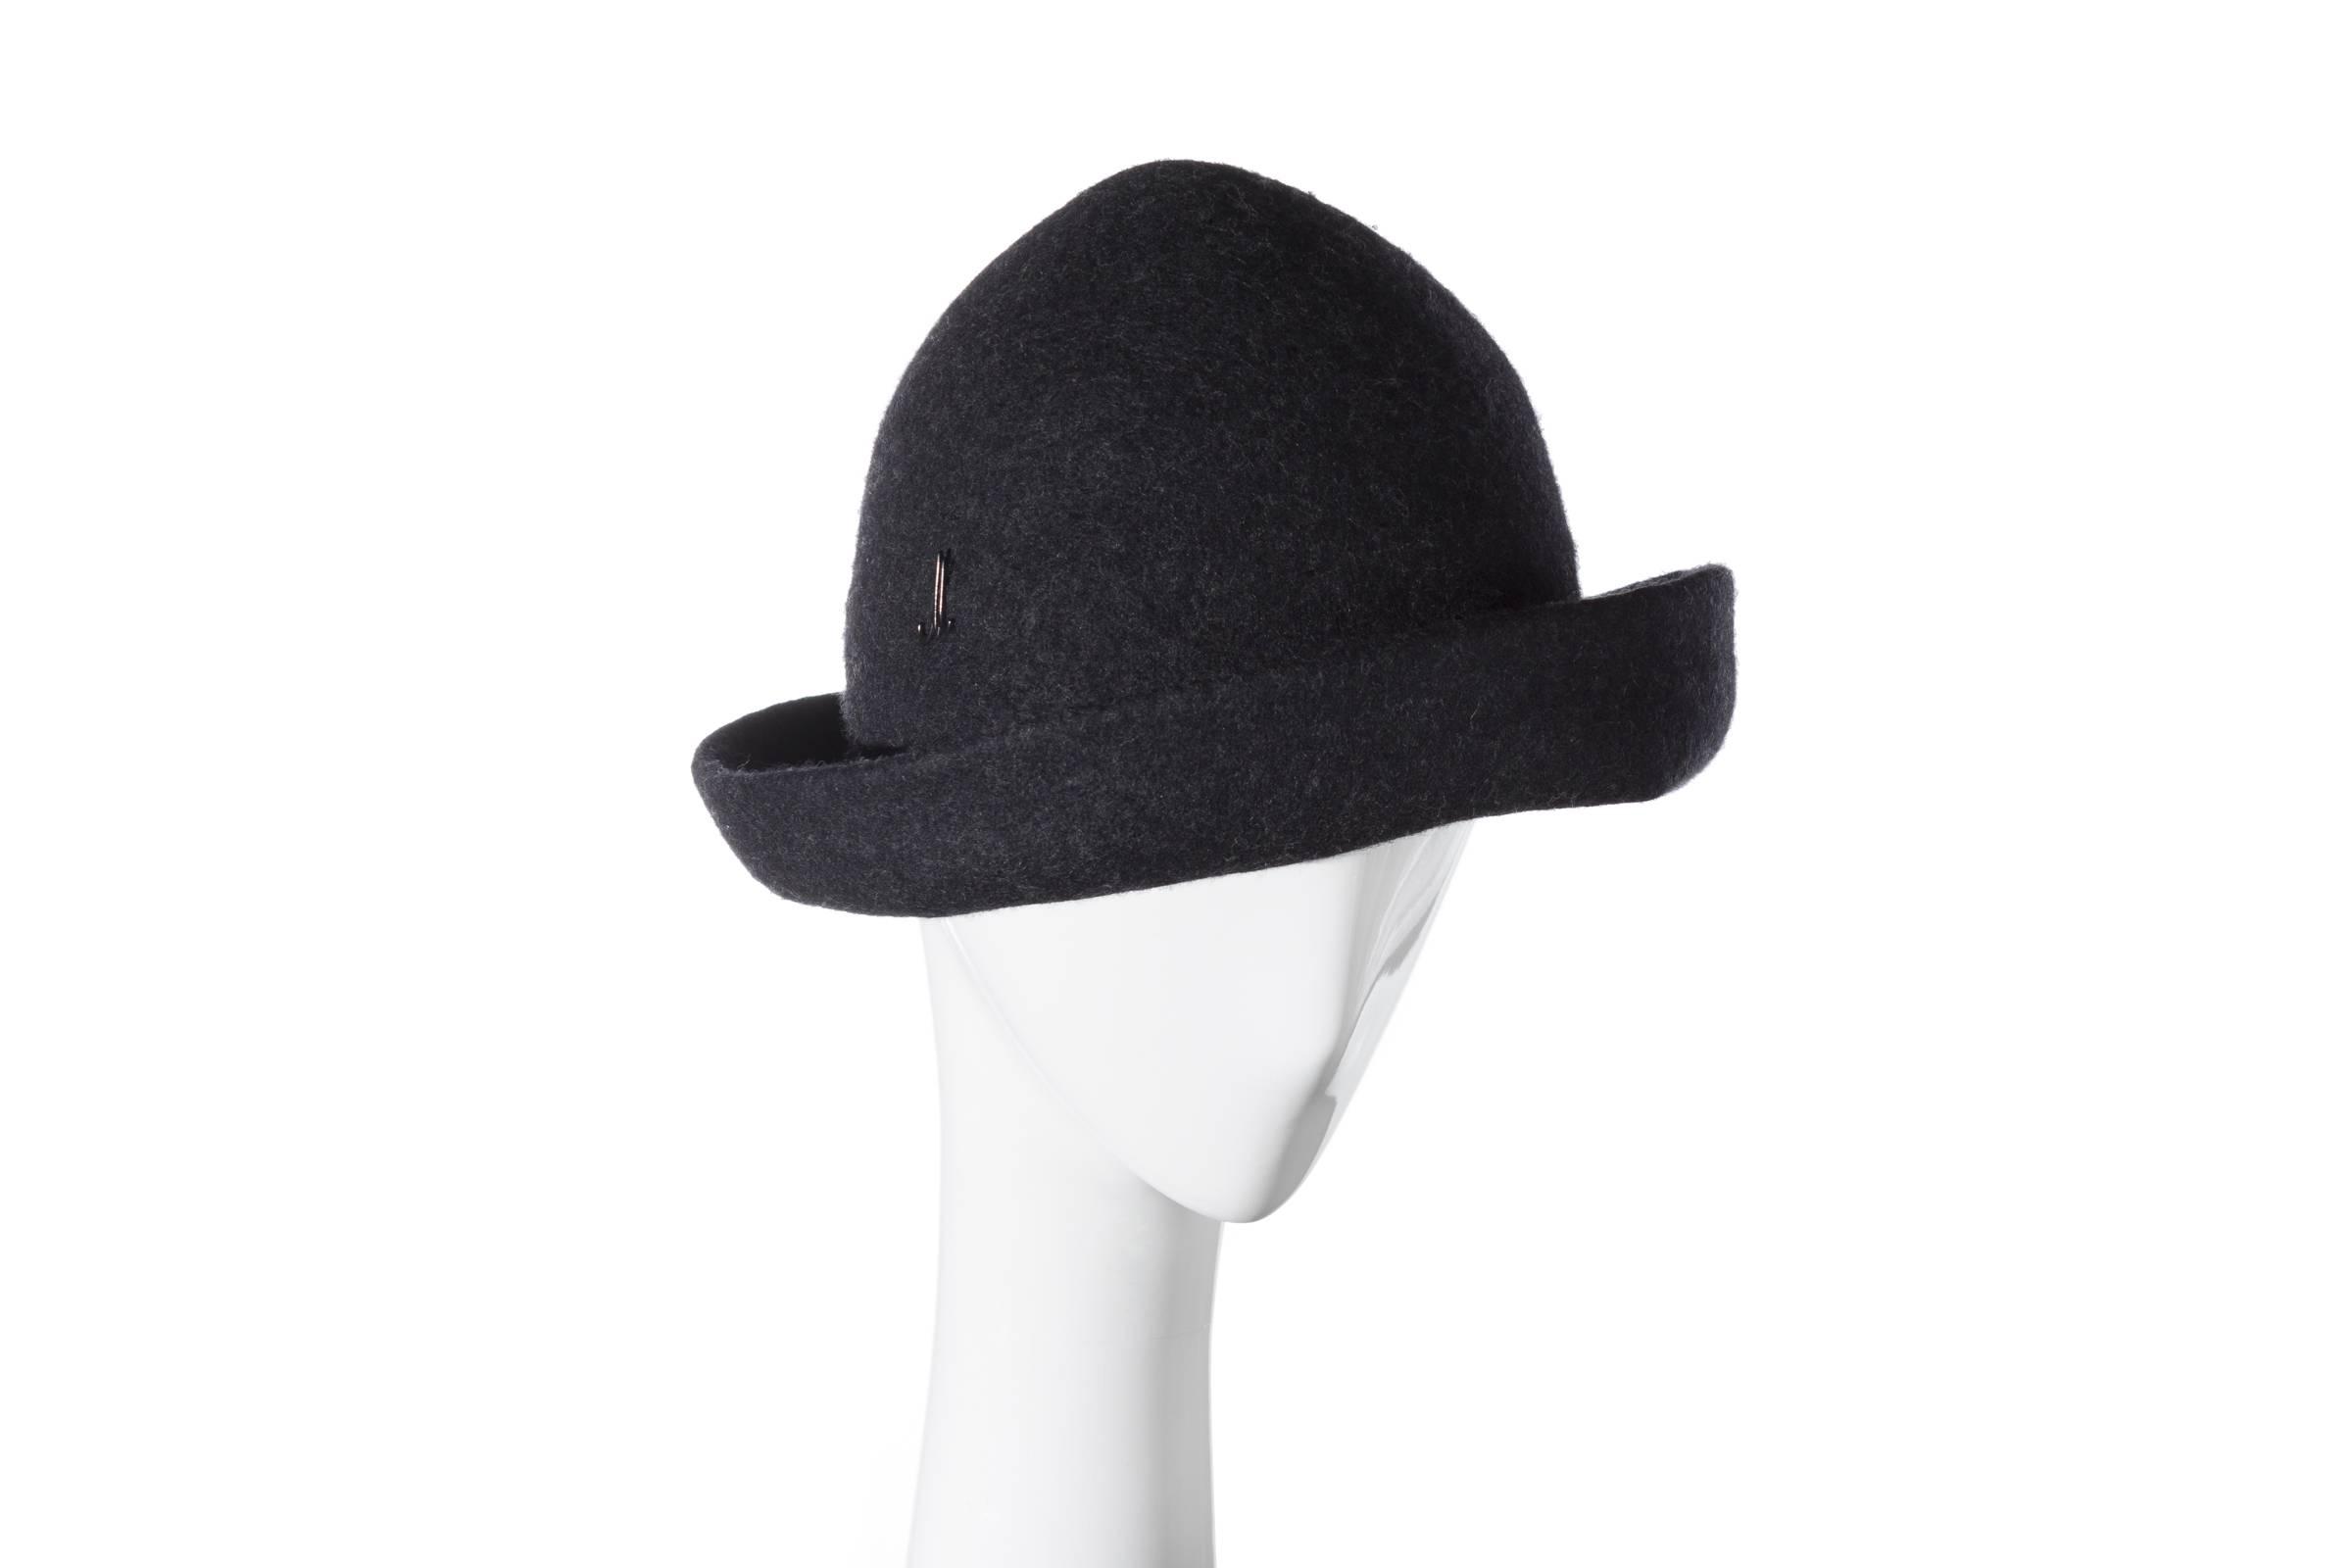 RESI REI - foldable hat - Wollfilz soft  ffd79f689b7